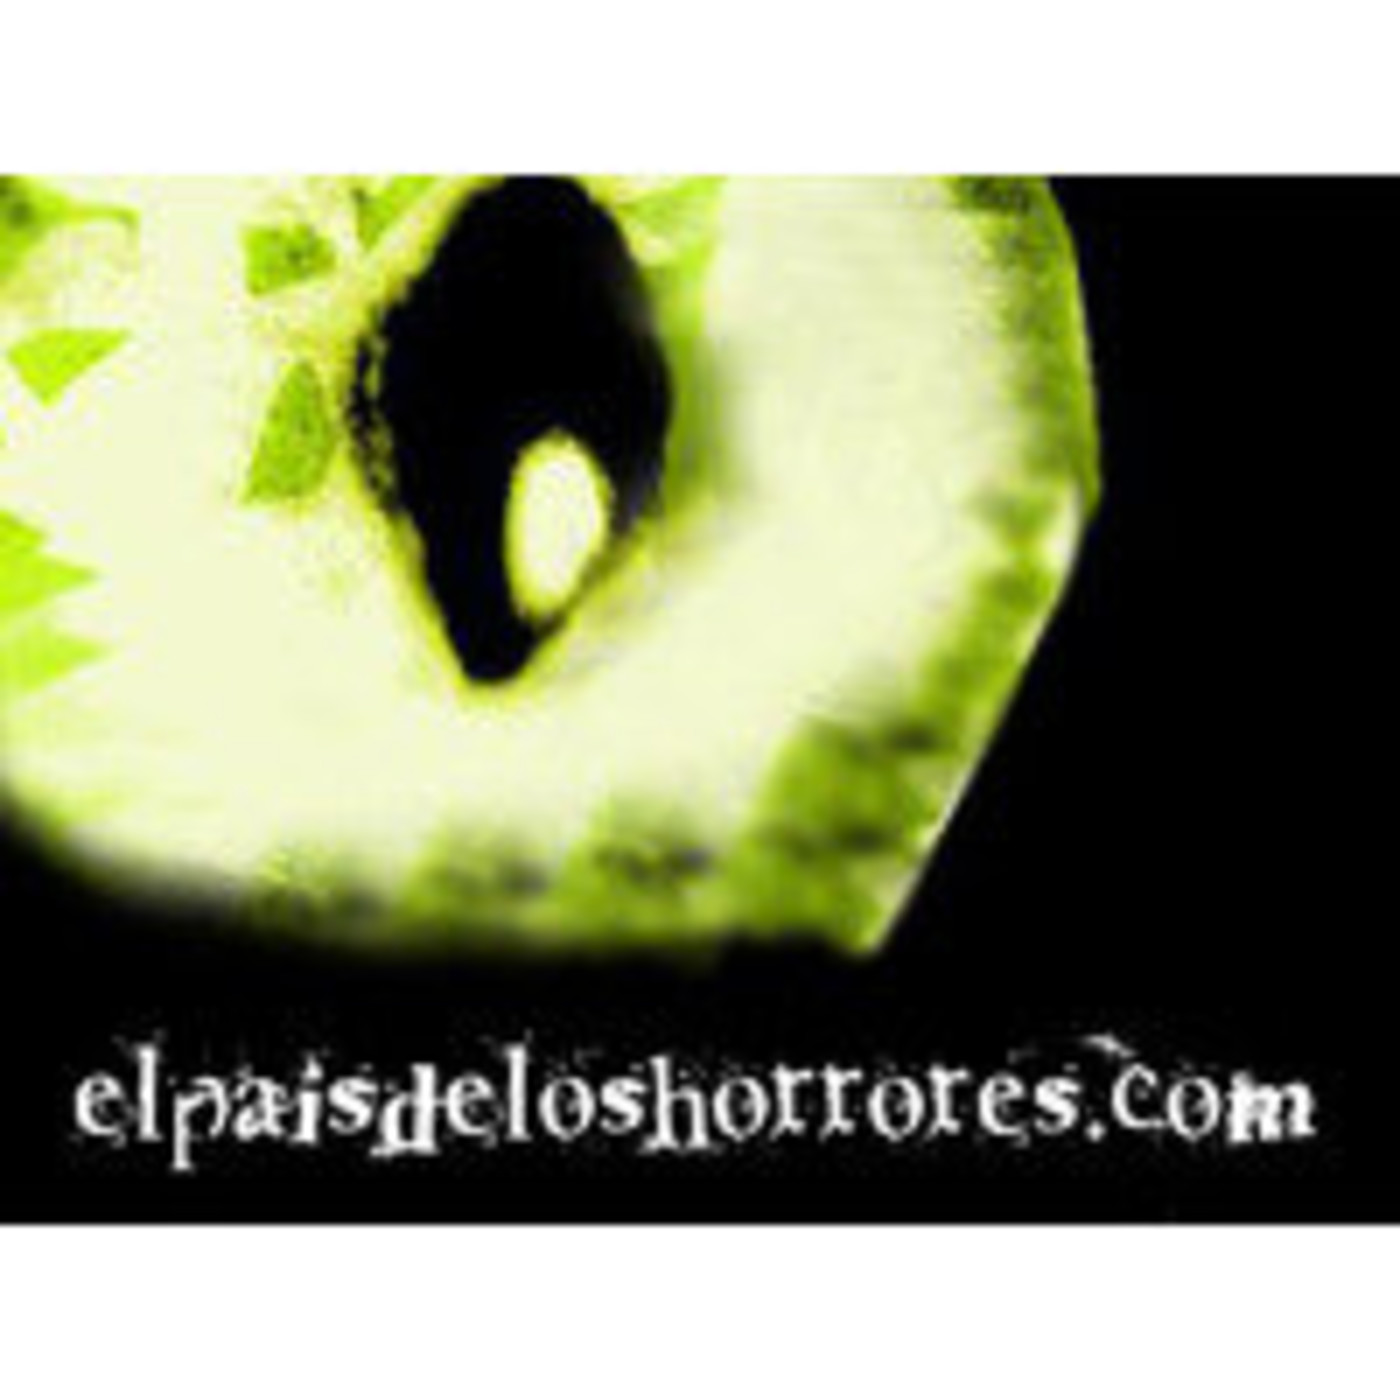 <![CDATA[Podcast ELENA EN EL PAÍS DE LOS HORRORES]]>